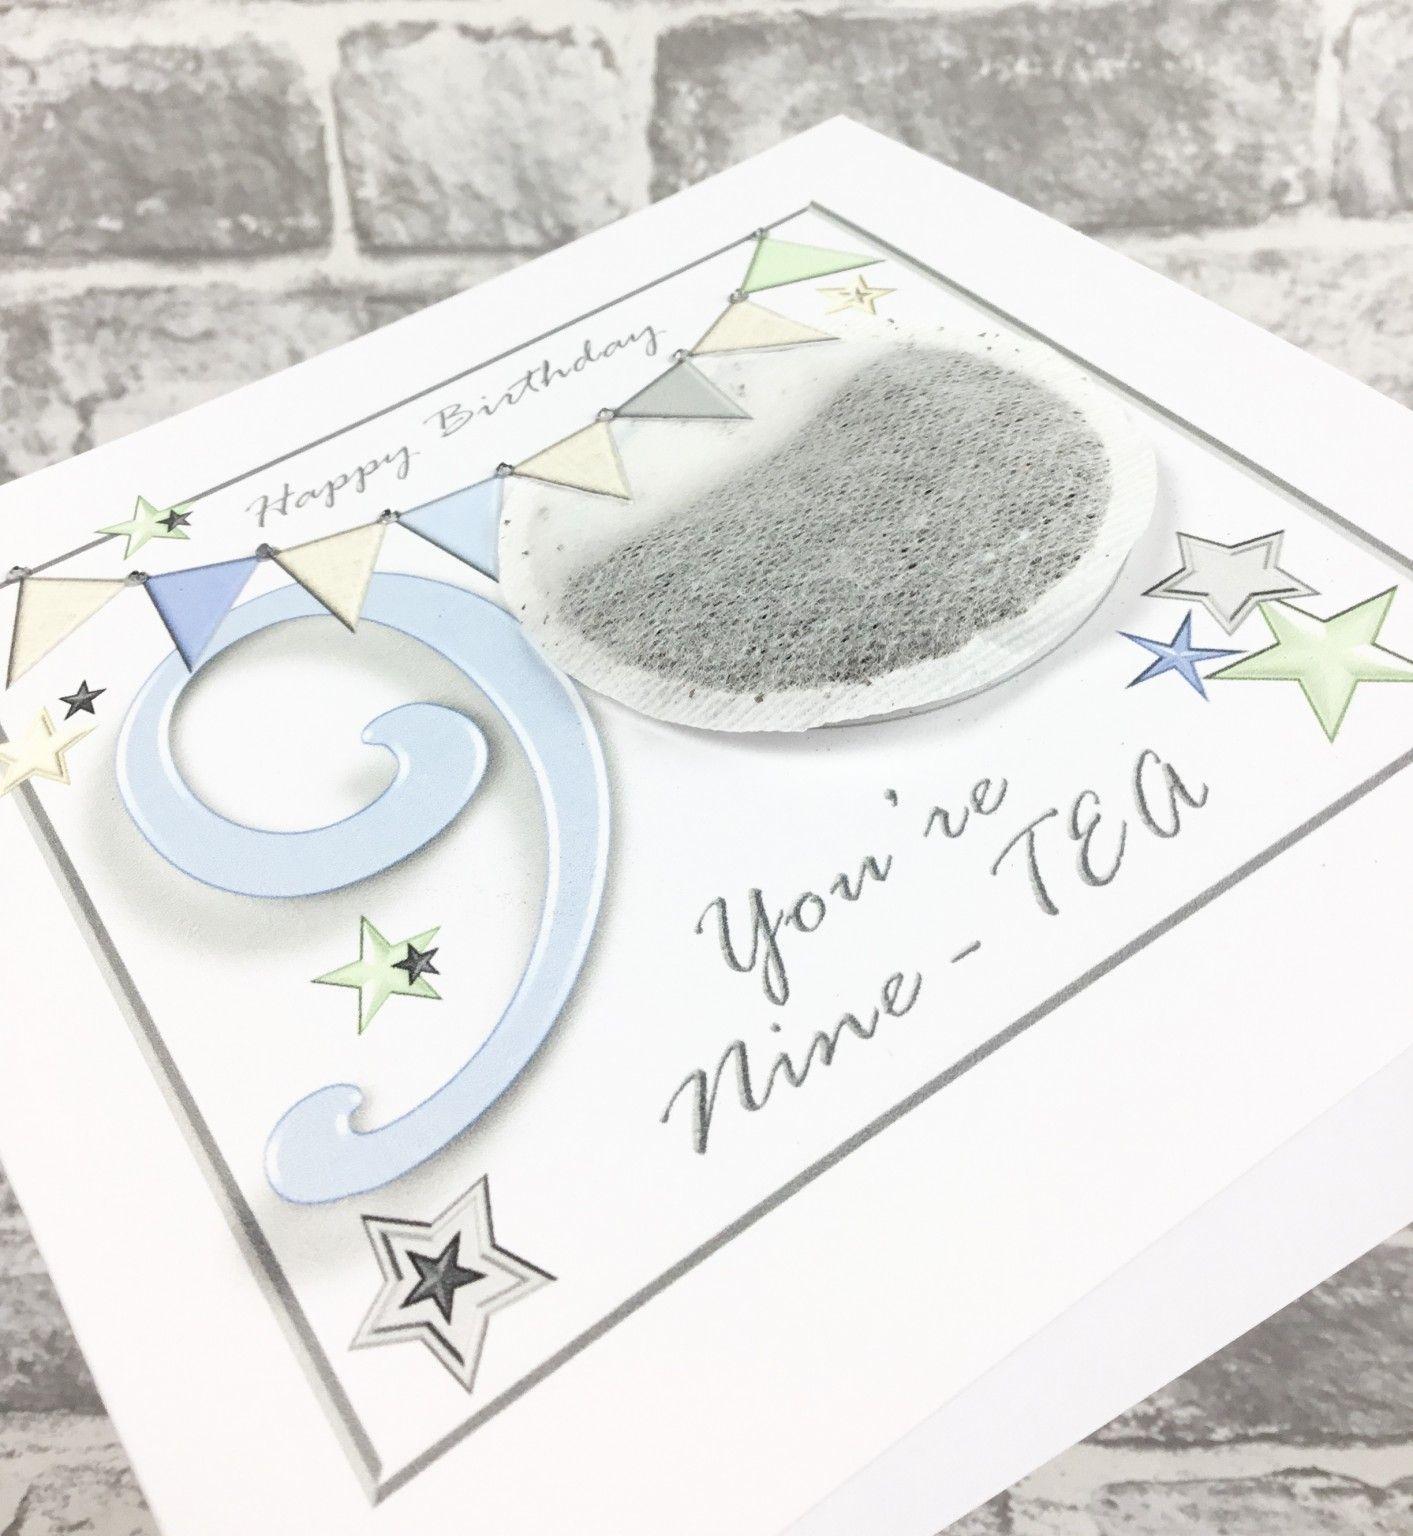 90th Birthday Card Personalised Birthday Card Helen Sutton Designs 90th Birthday Cards 30th Birthday Cards 70th Birthday Card